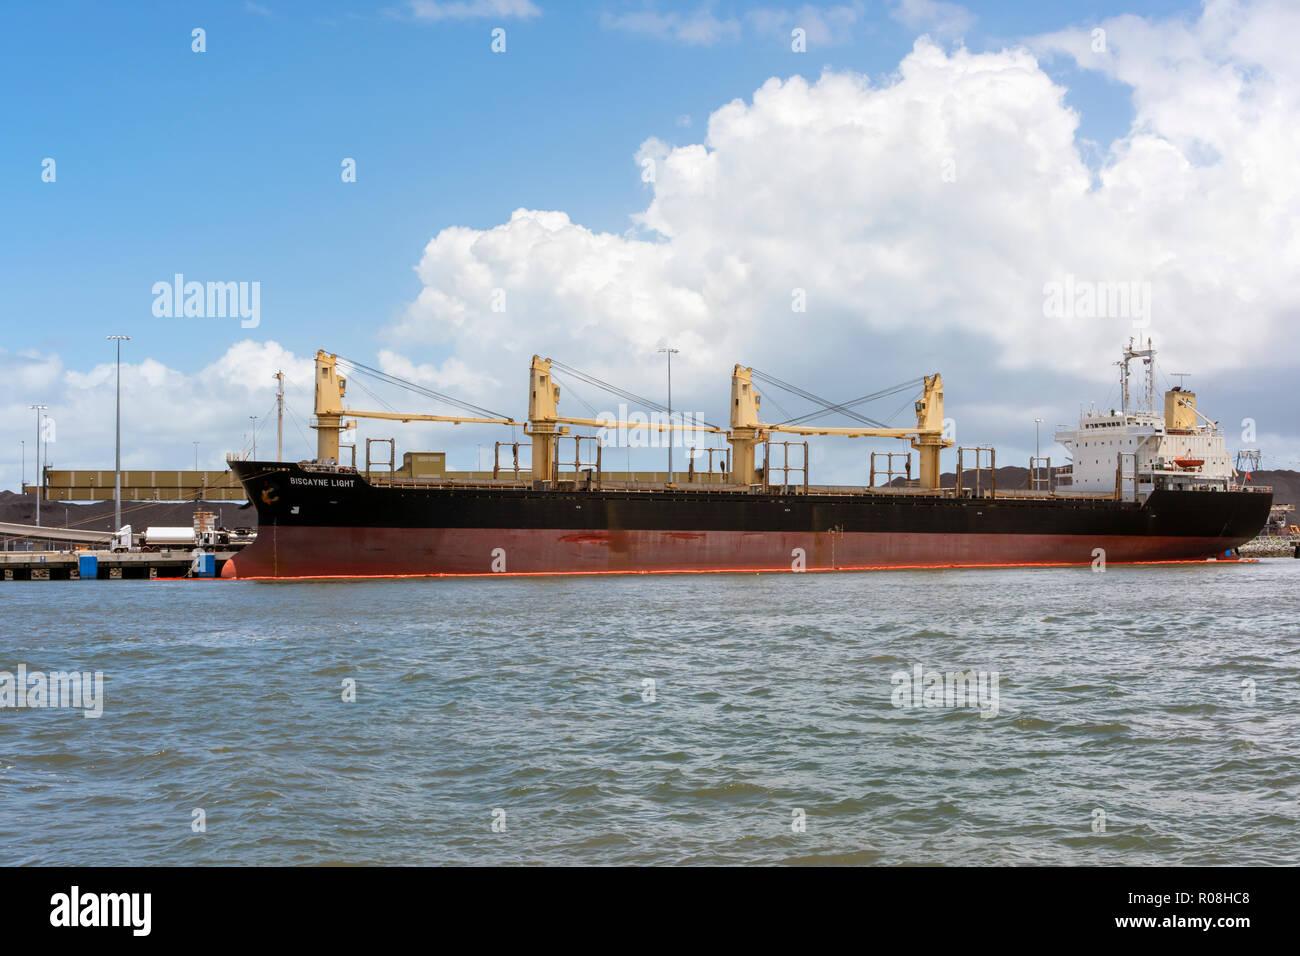 Mur Eco Splendor general cargo ship docked at terminal on Brisbane River. - Stock Image